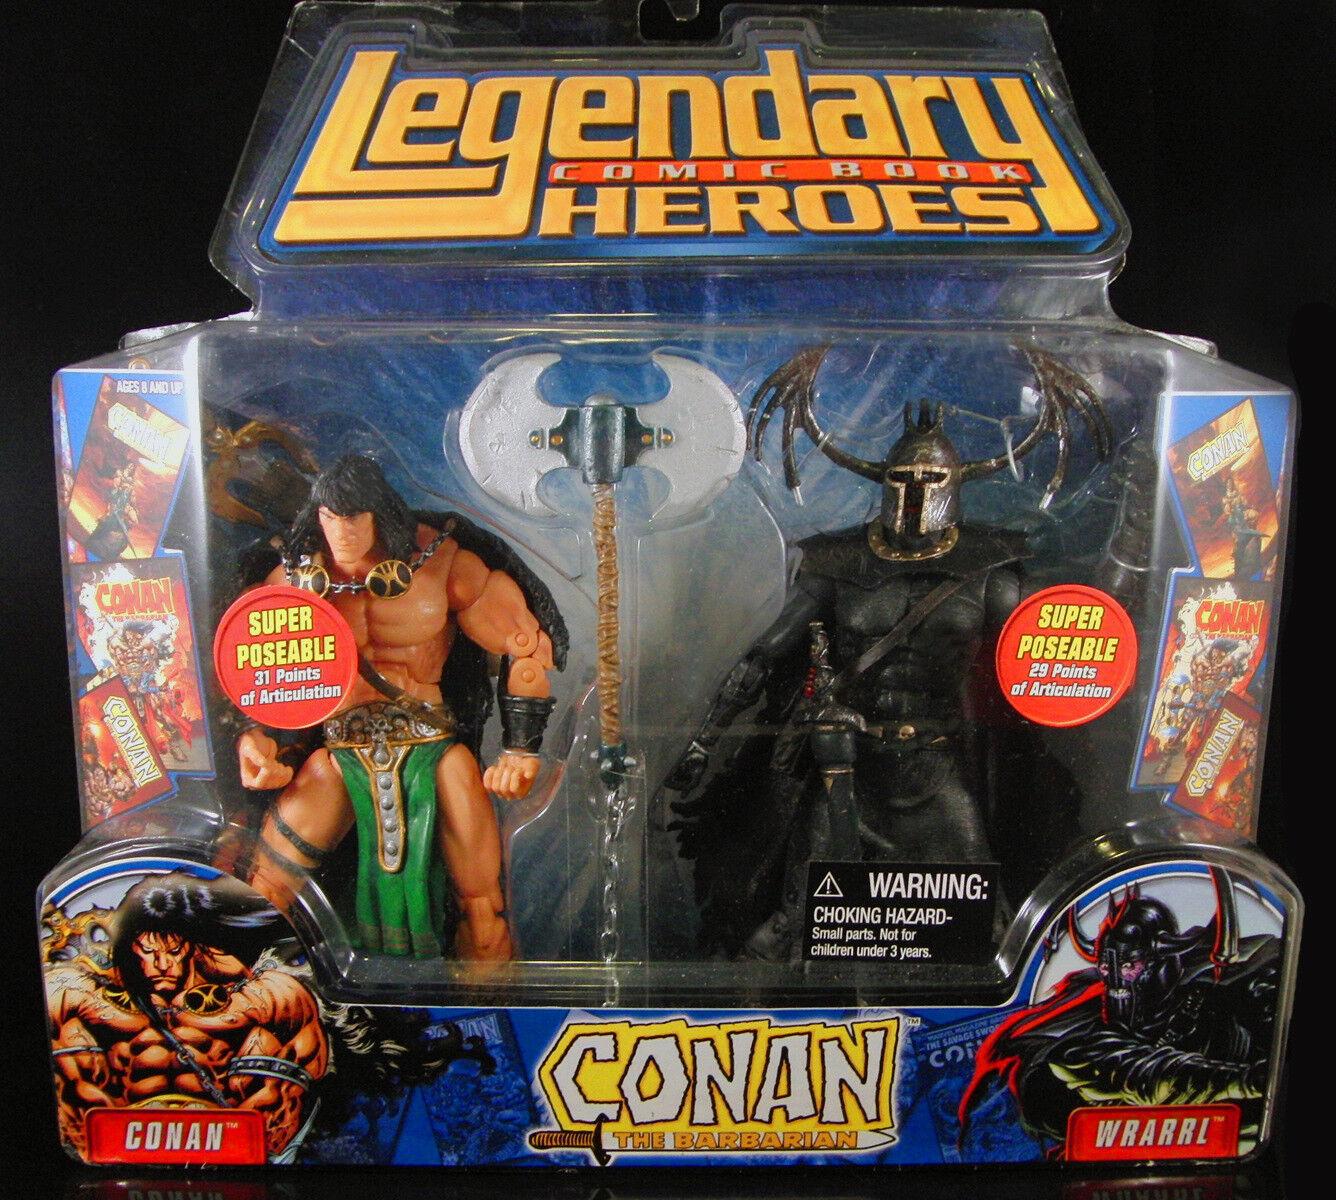 Marvel legends comic heroes conan the barbarian vs wrarrl set toy biz figure